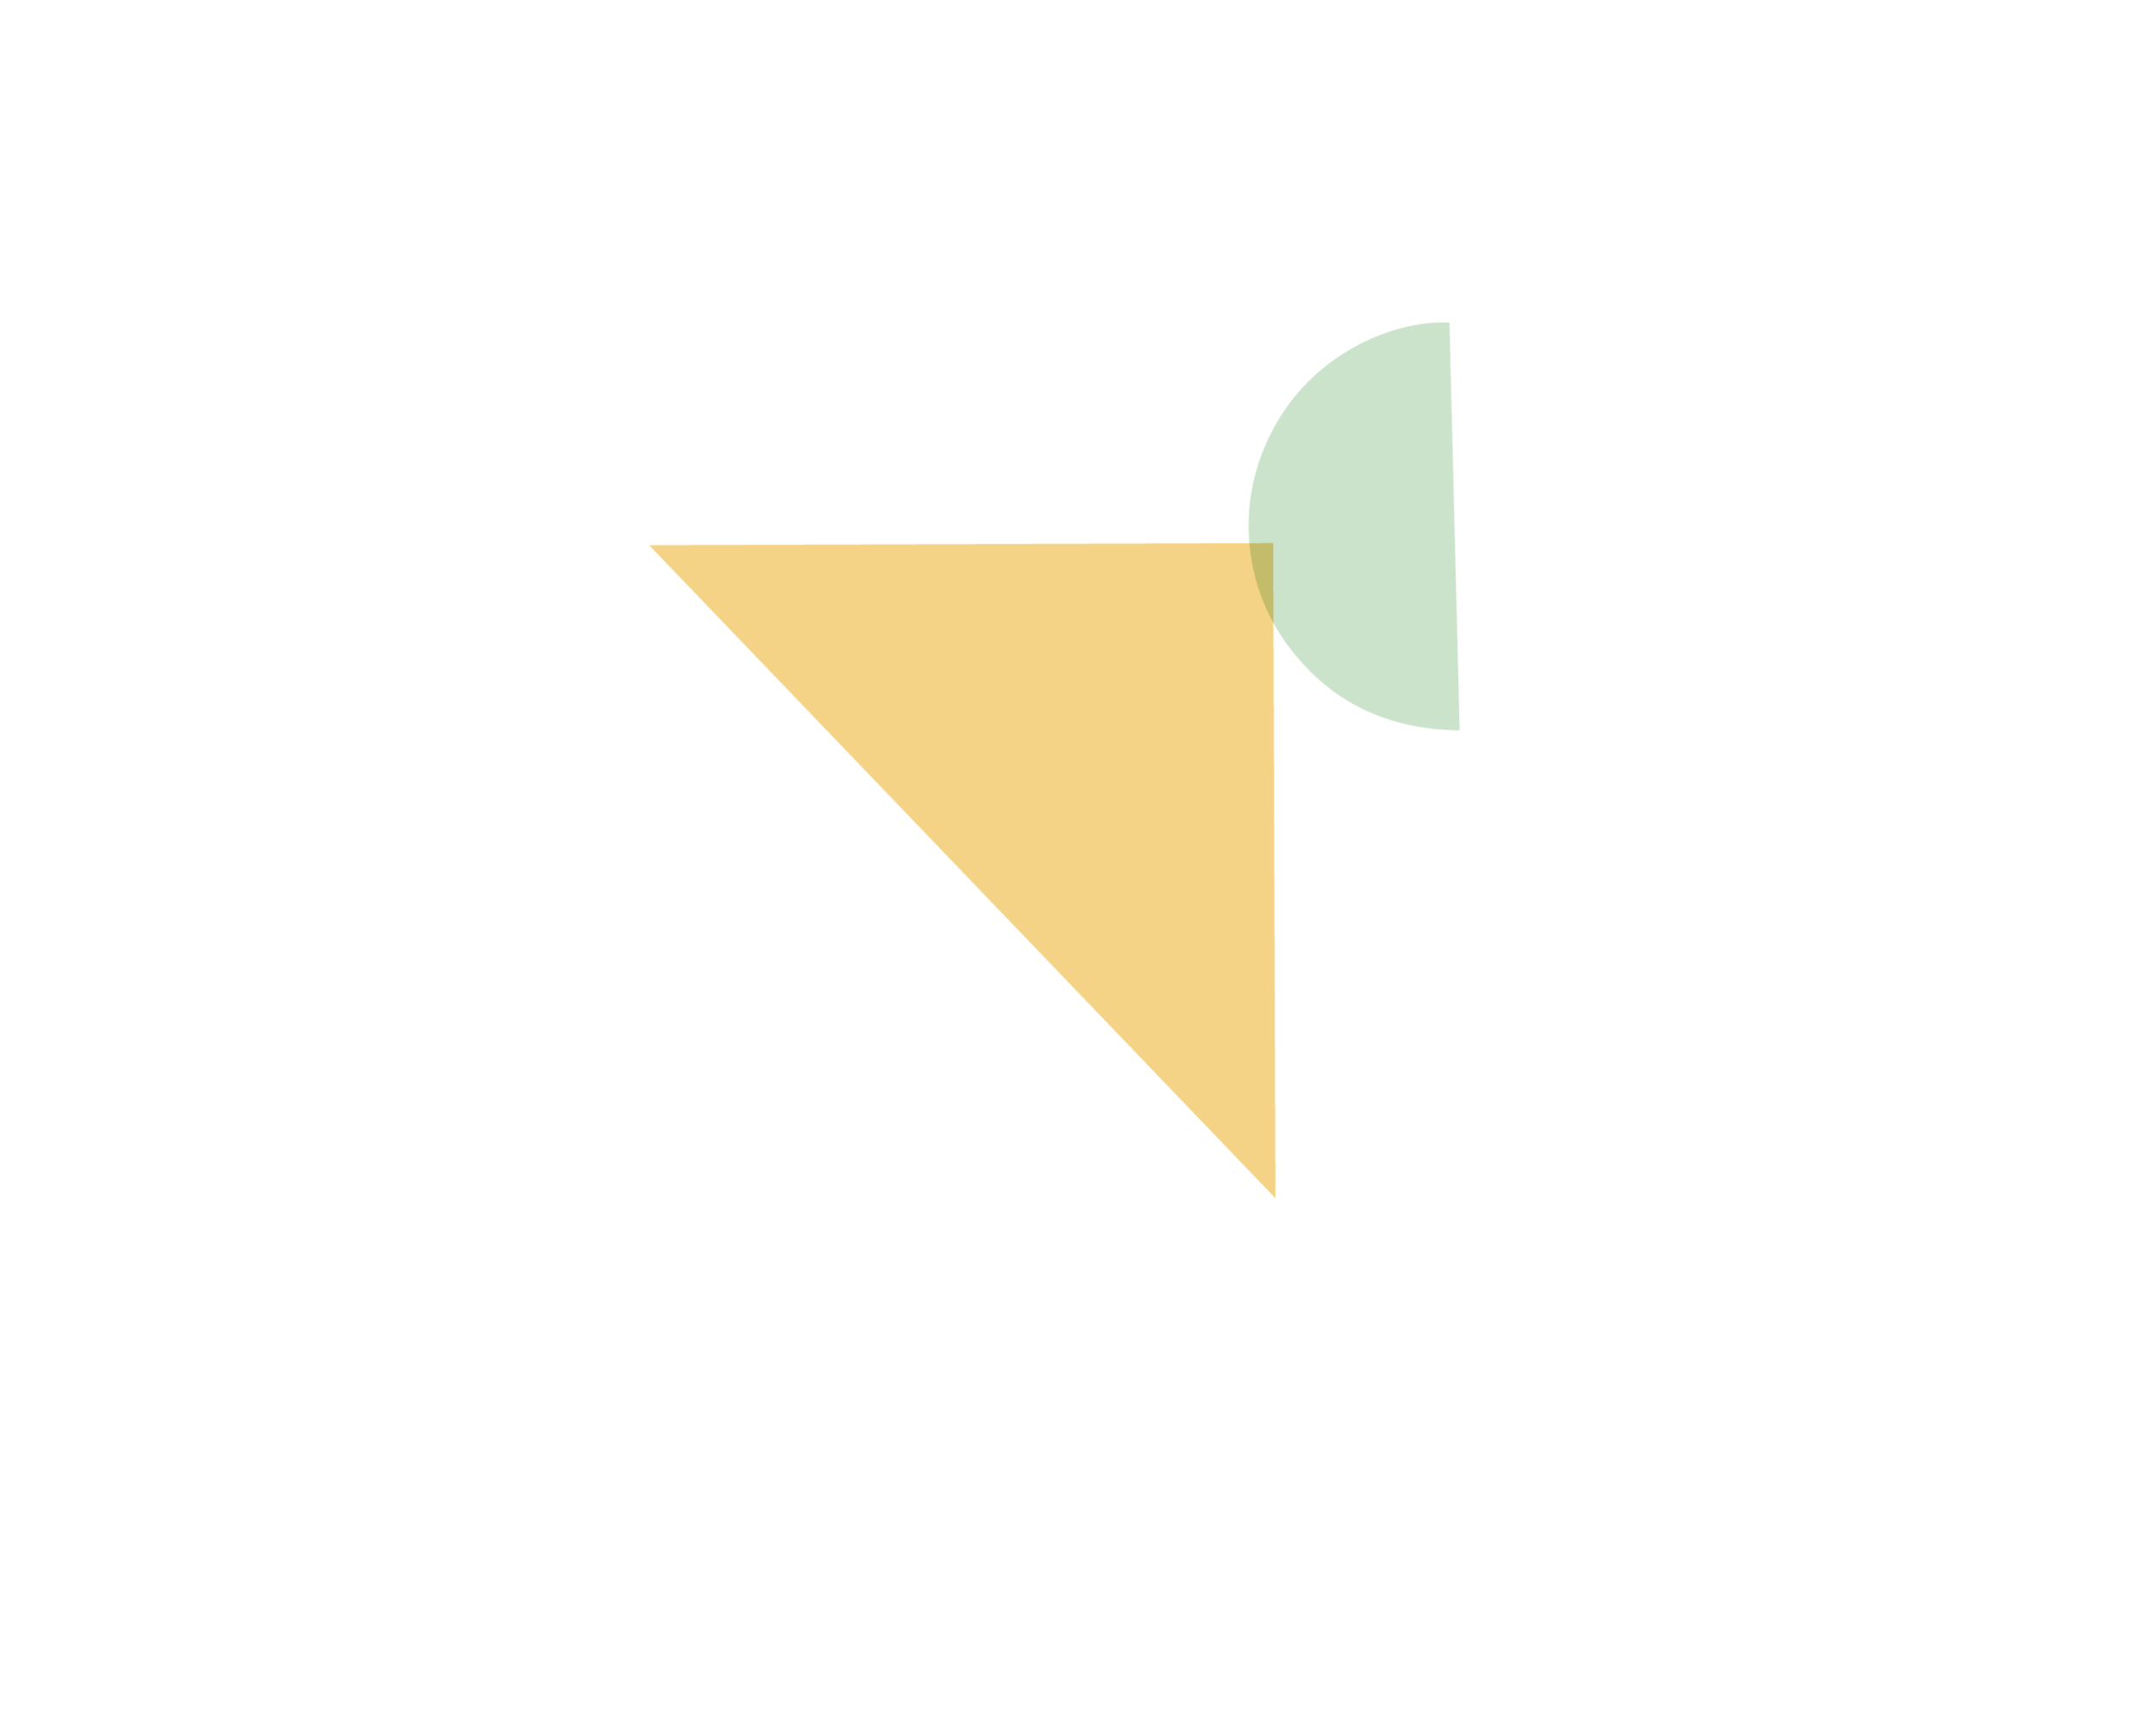 nns_shapes_r1-08.png